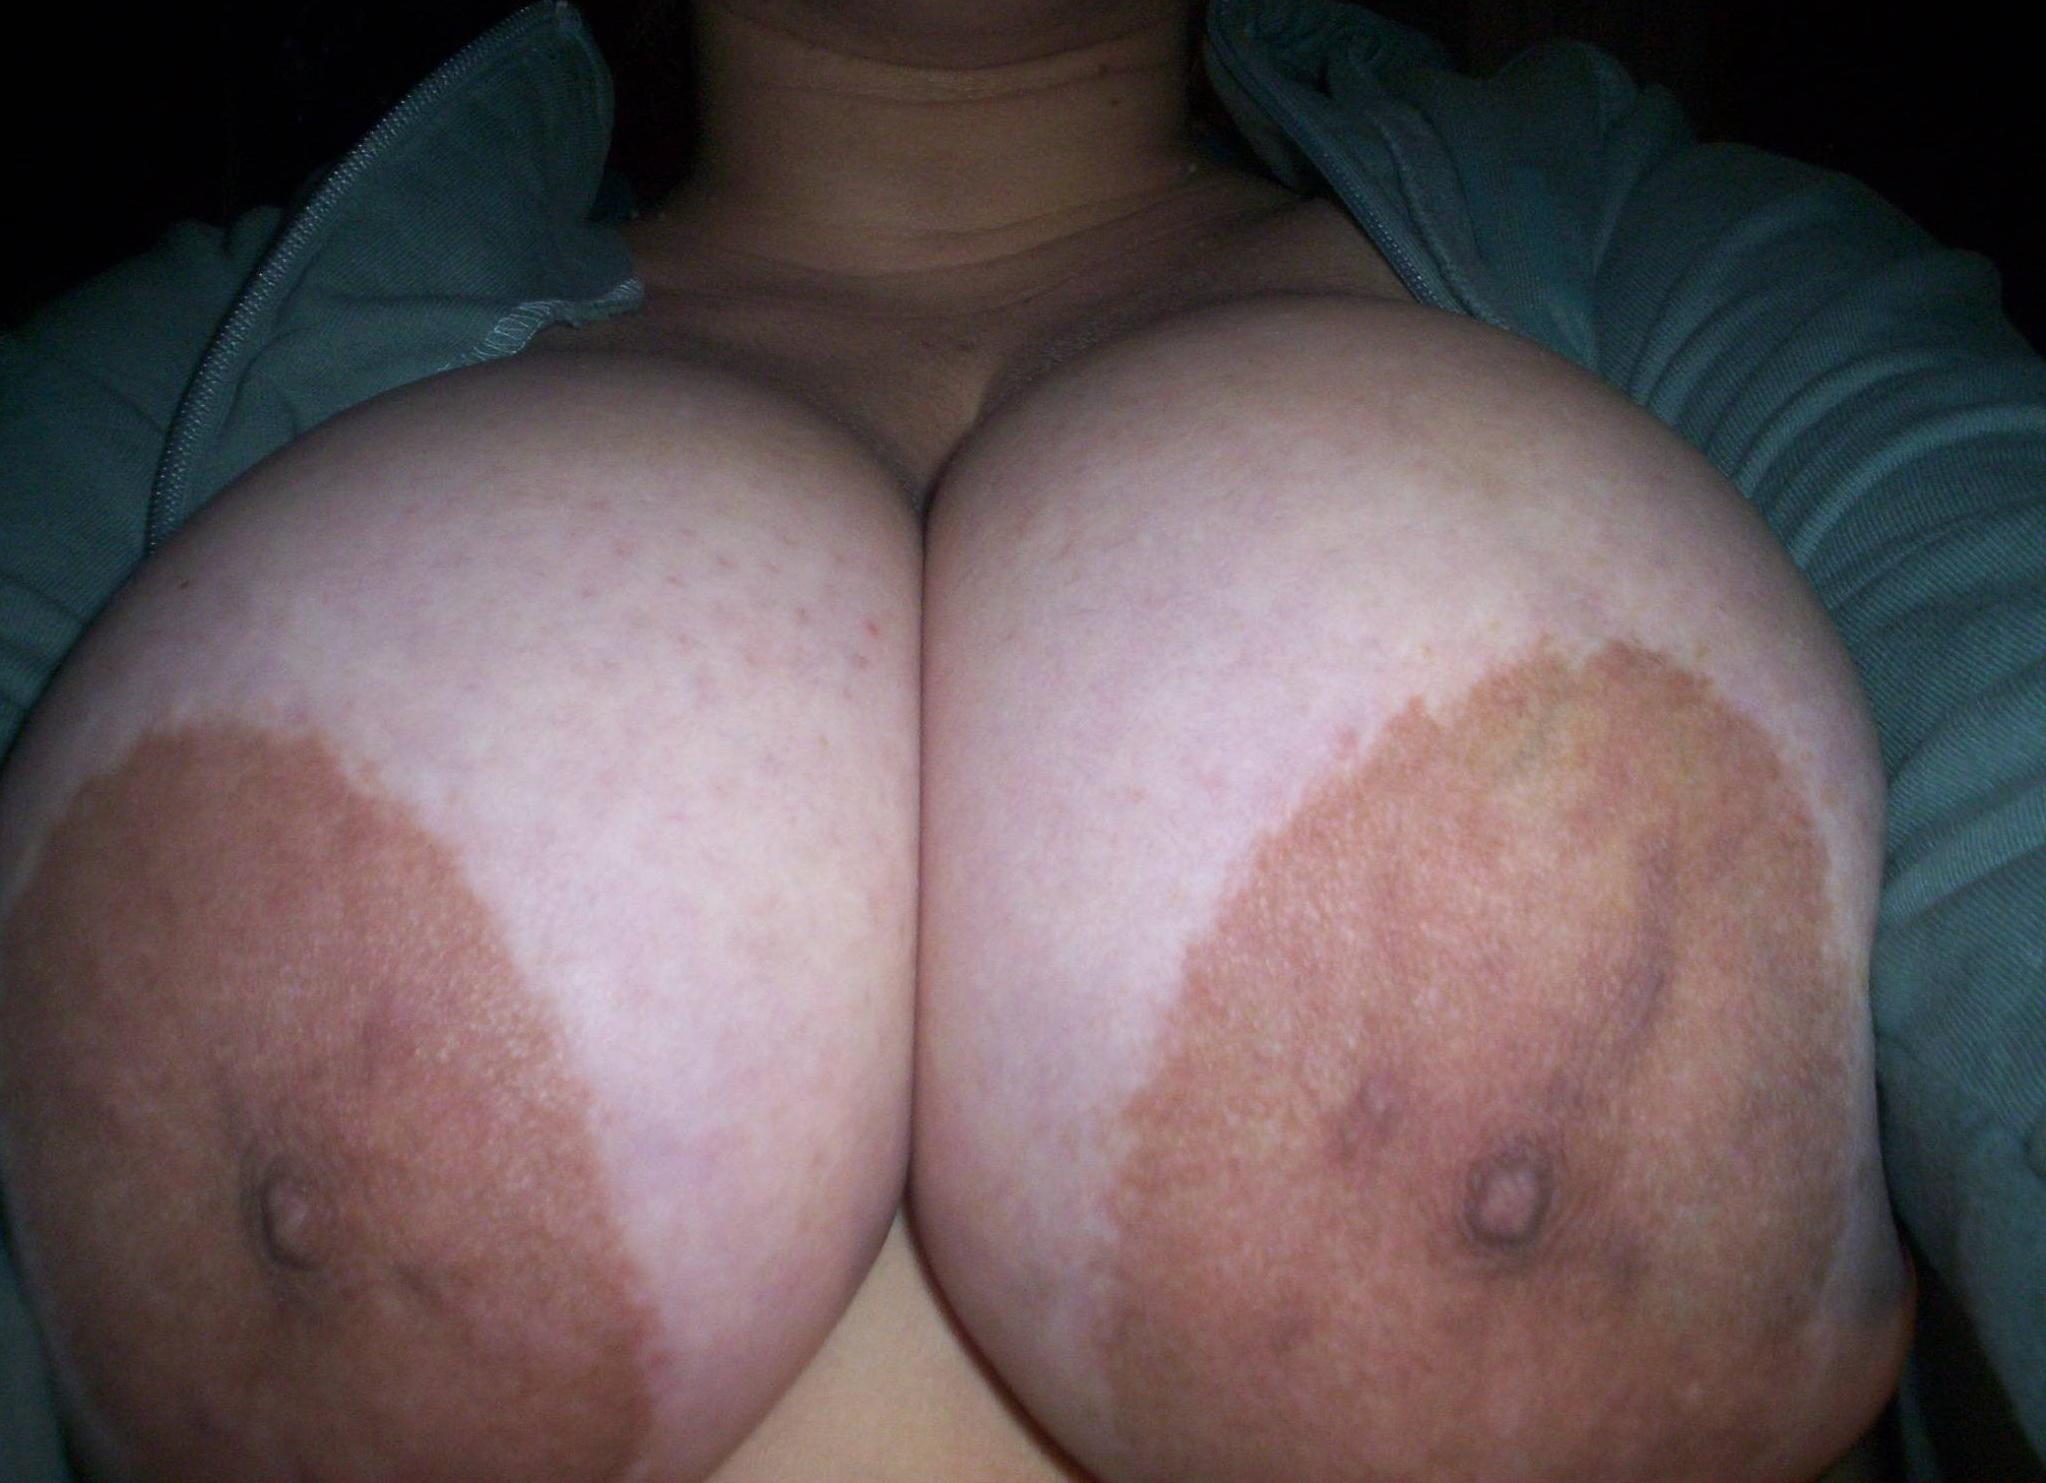 ameara-lavey-porno